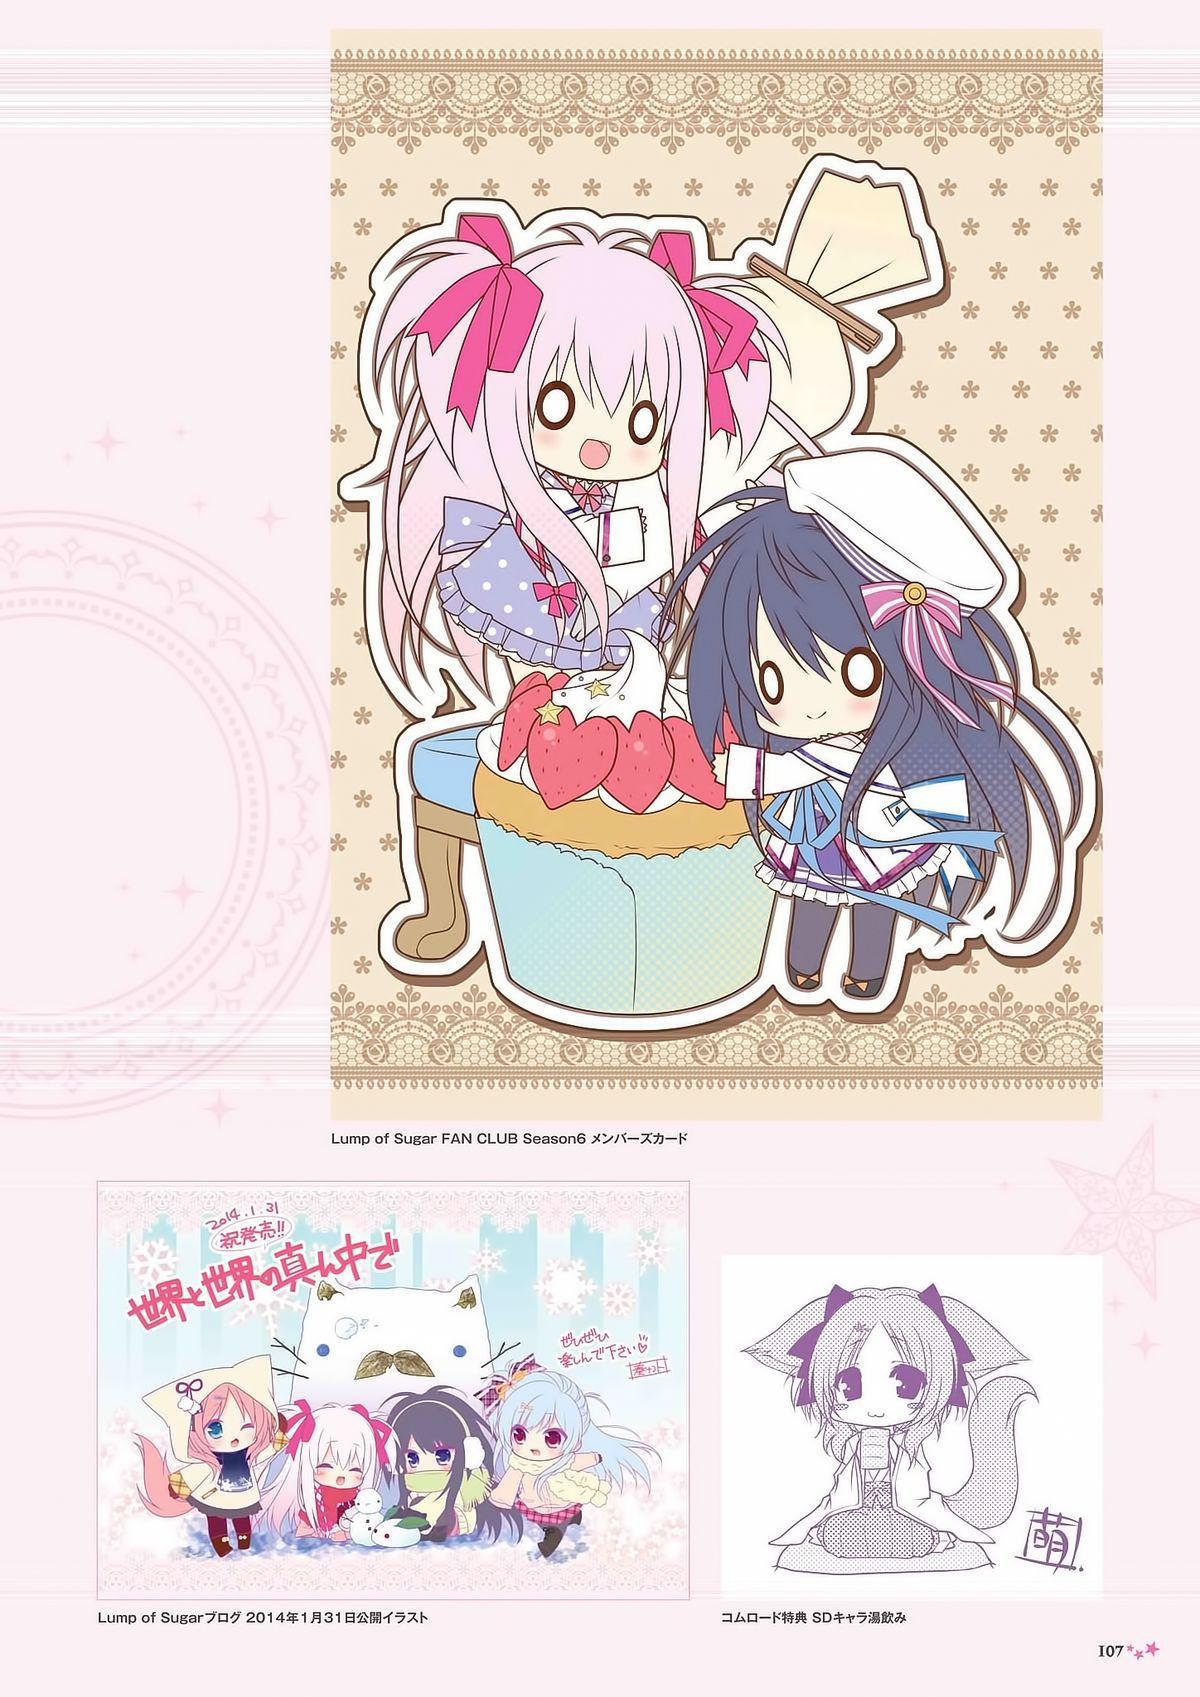 Sekai to Sekai no Mannaka de Visual Fanbook 104